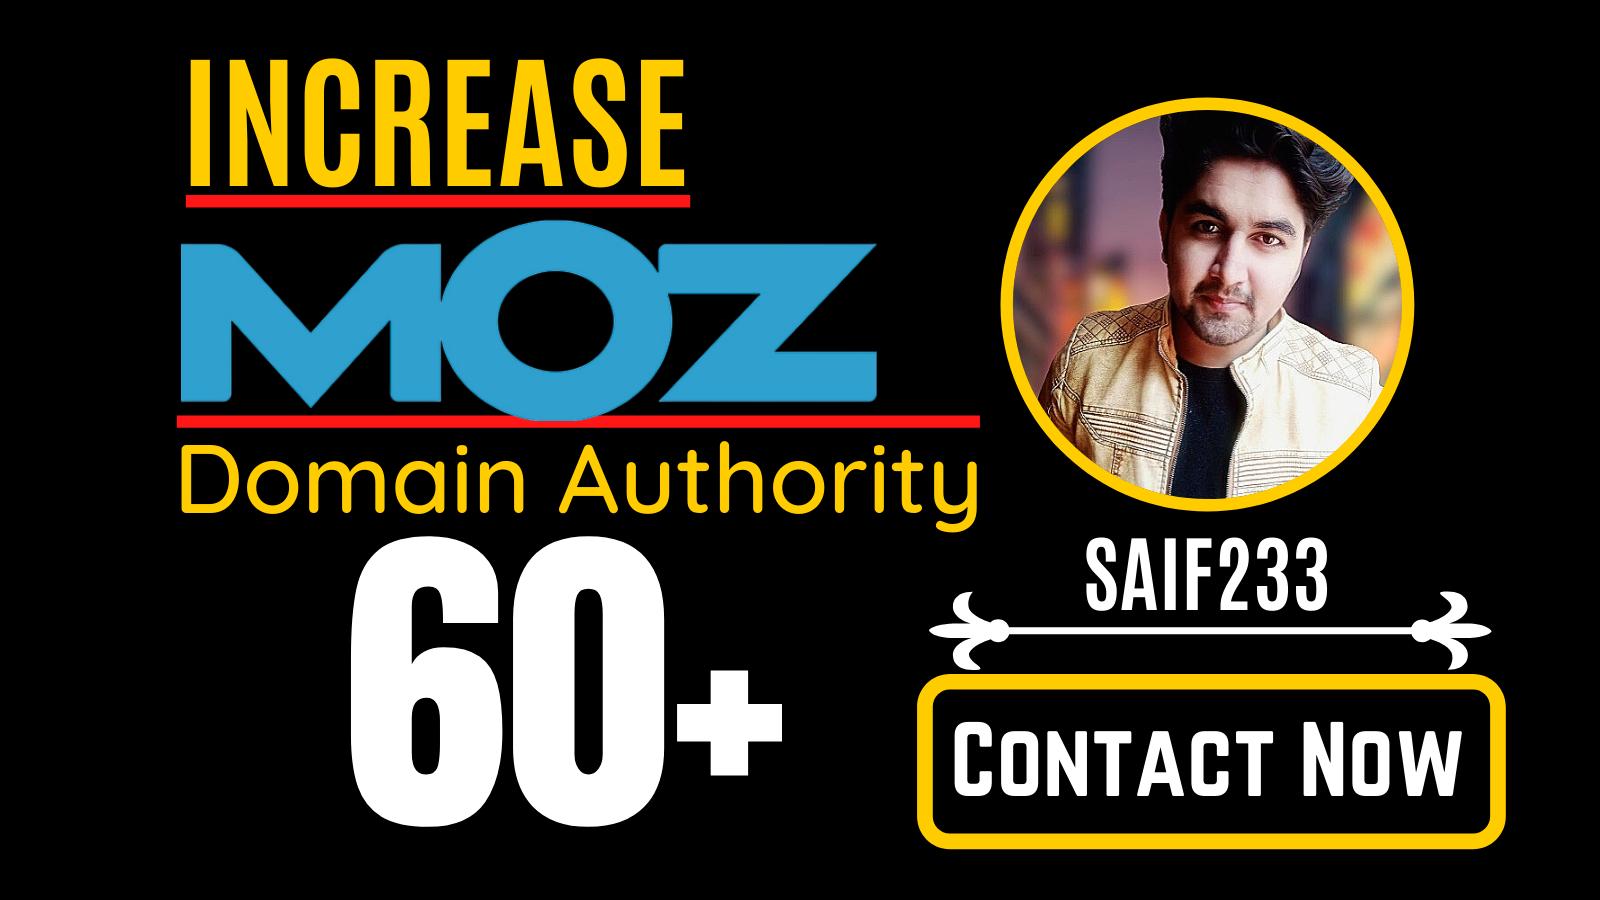 increase domain Authority,  Increase MOZ DA 60 plus